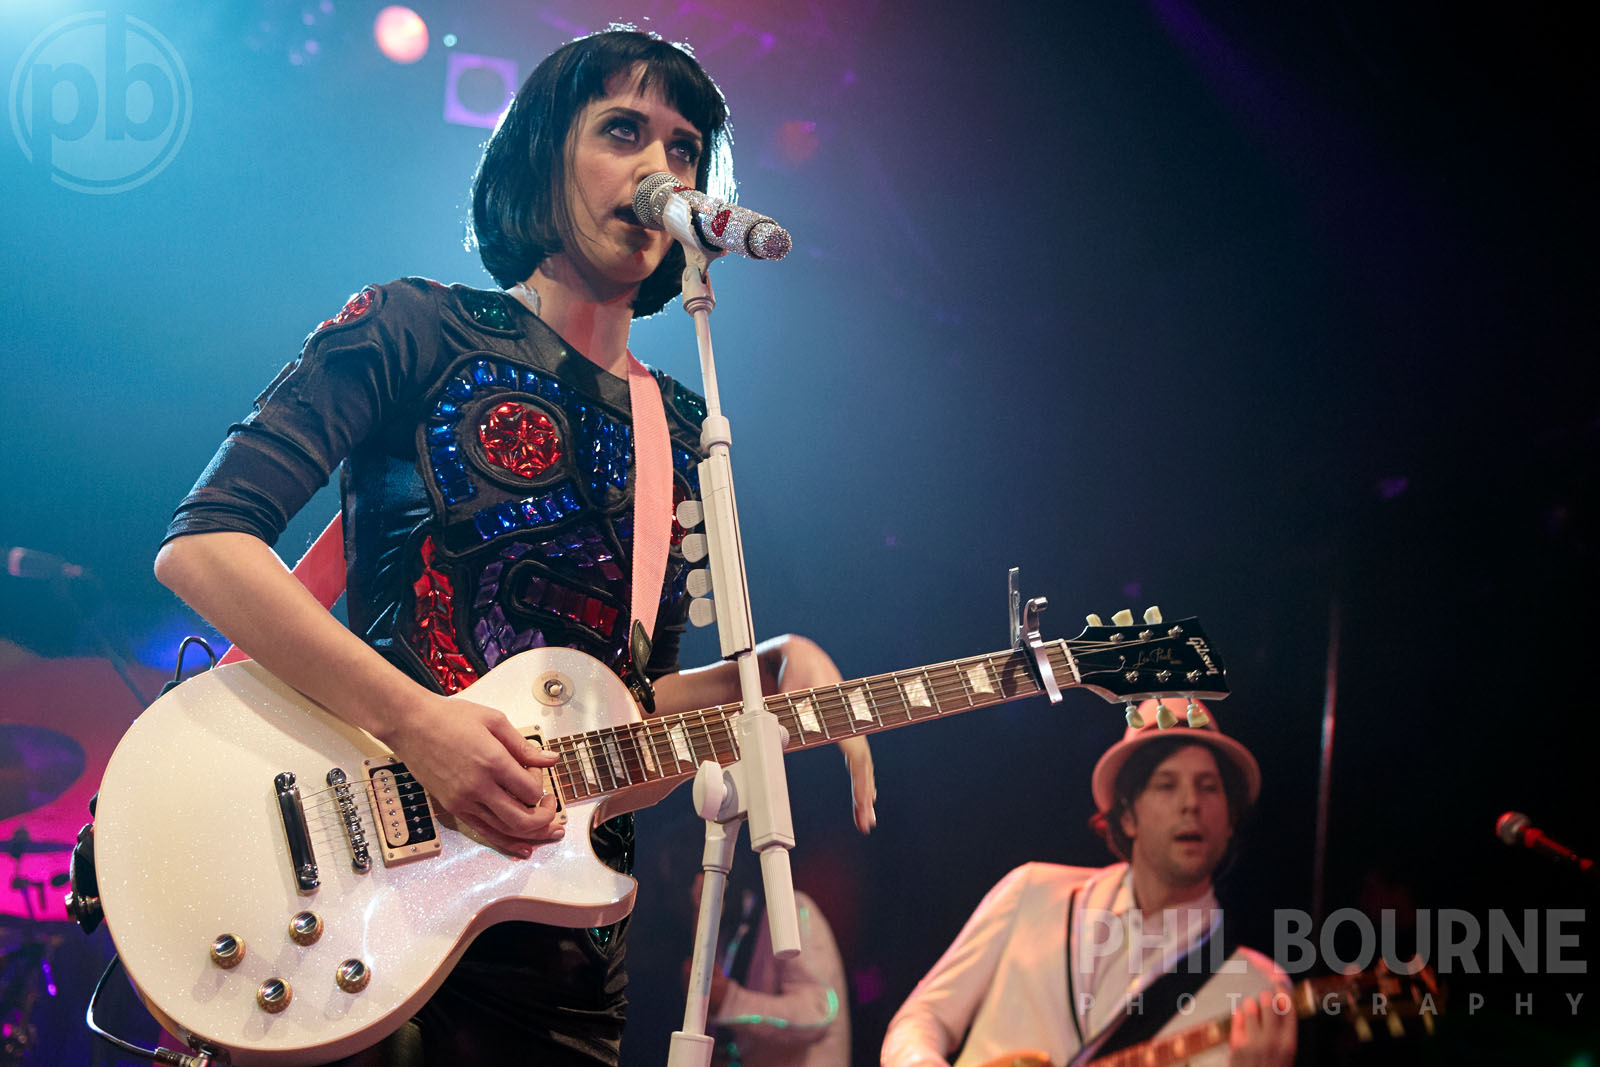 046_Live_Music_Photographer_London_Katy_Perry_001.jpg